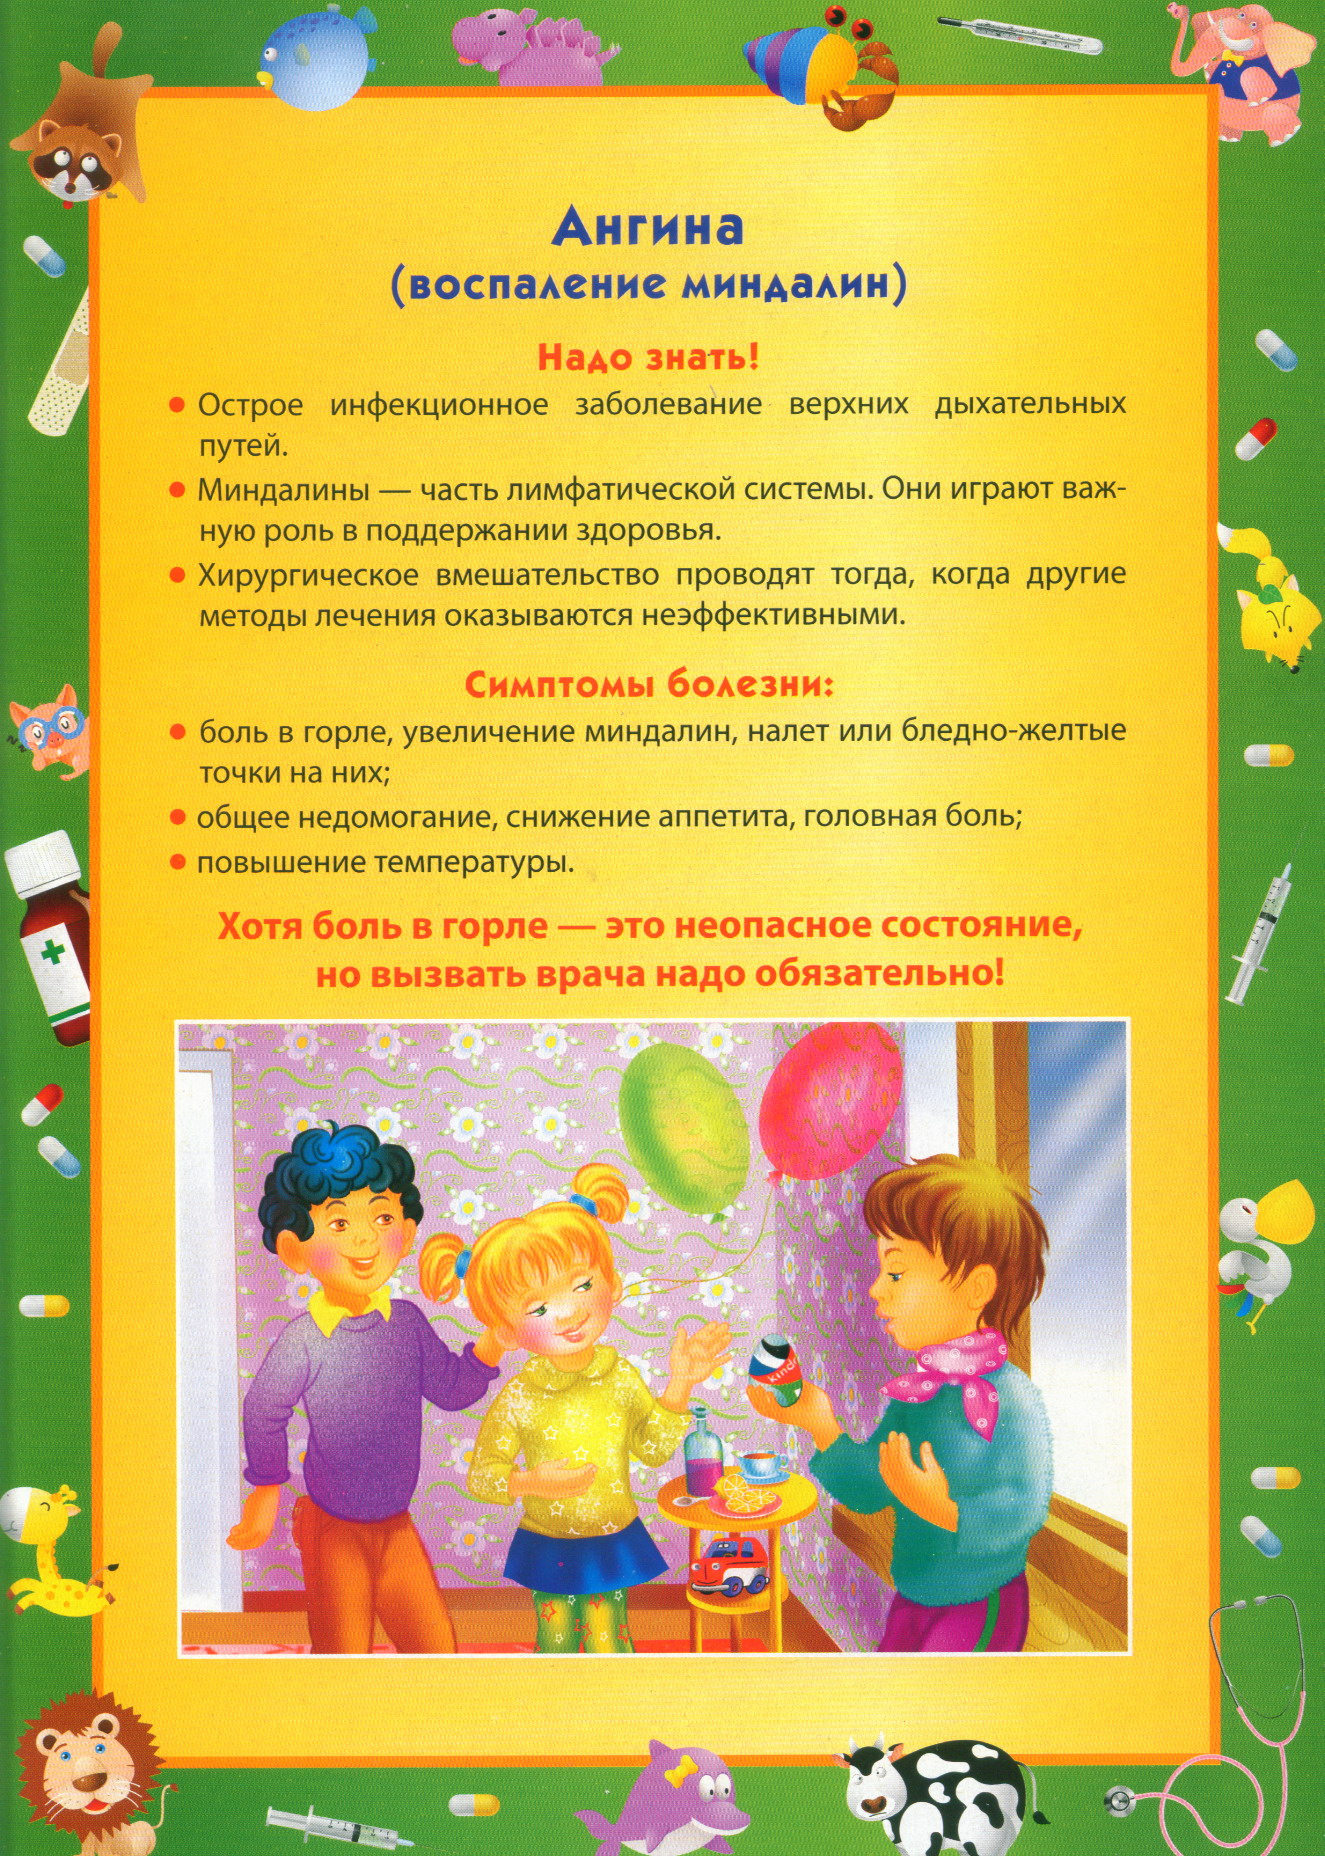 12.04.2012 16-17-46_0175